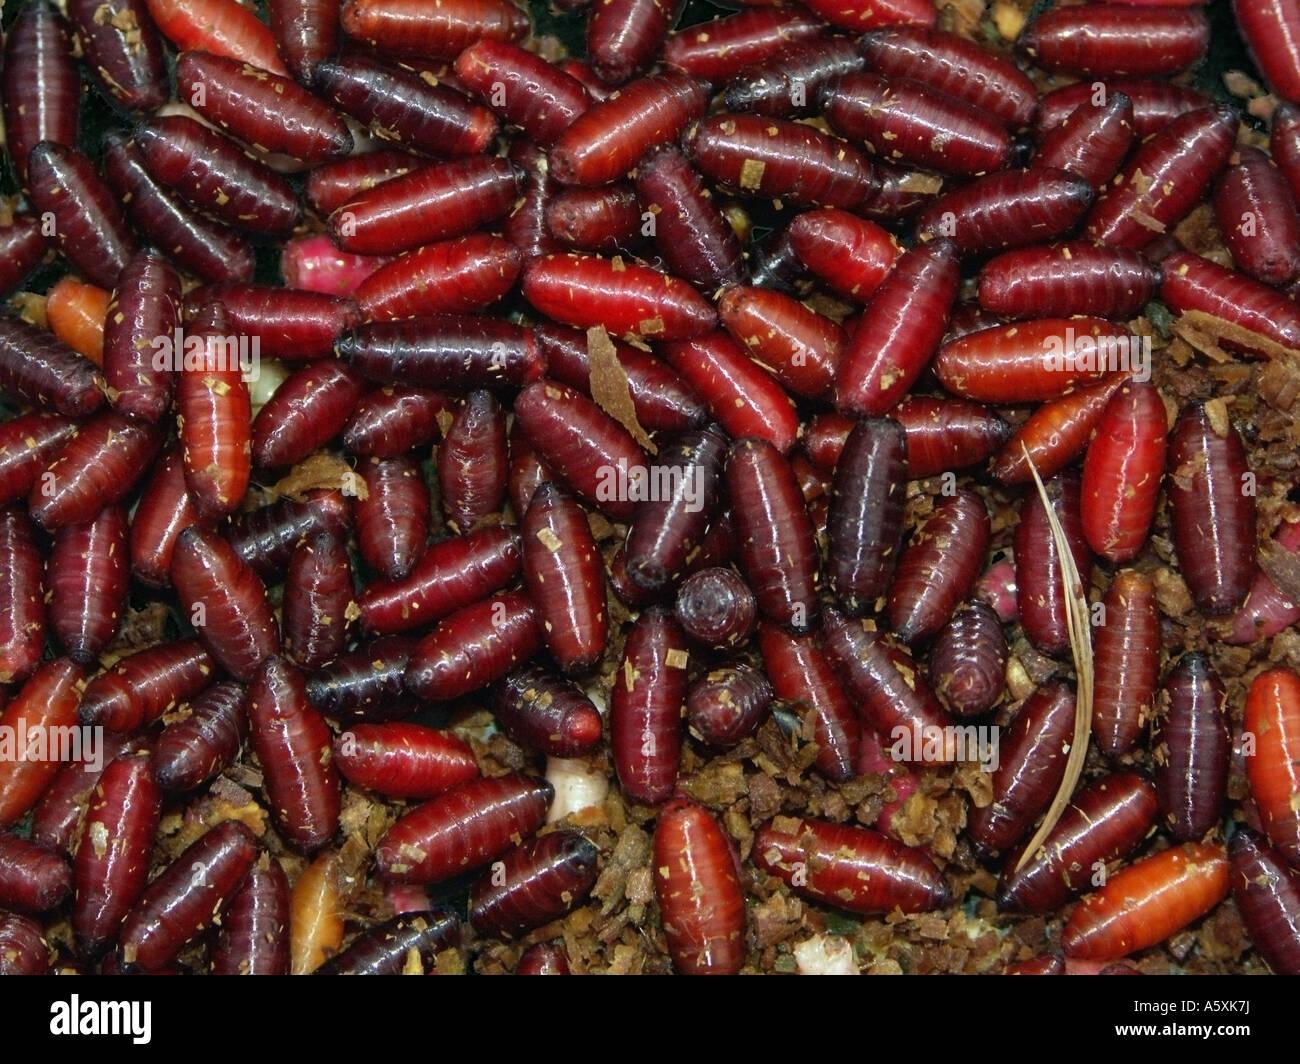 Maggot cocoons. - Stock Image